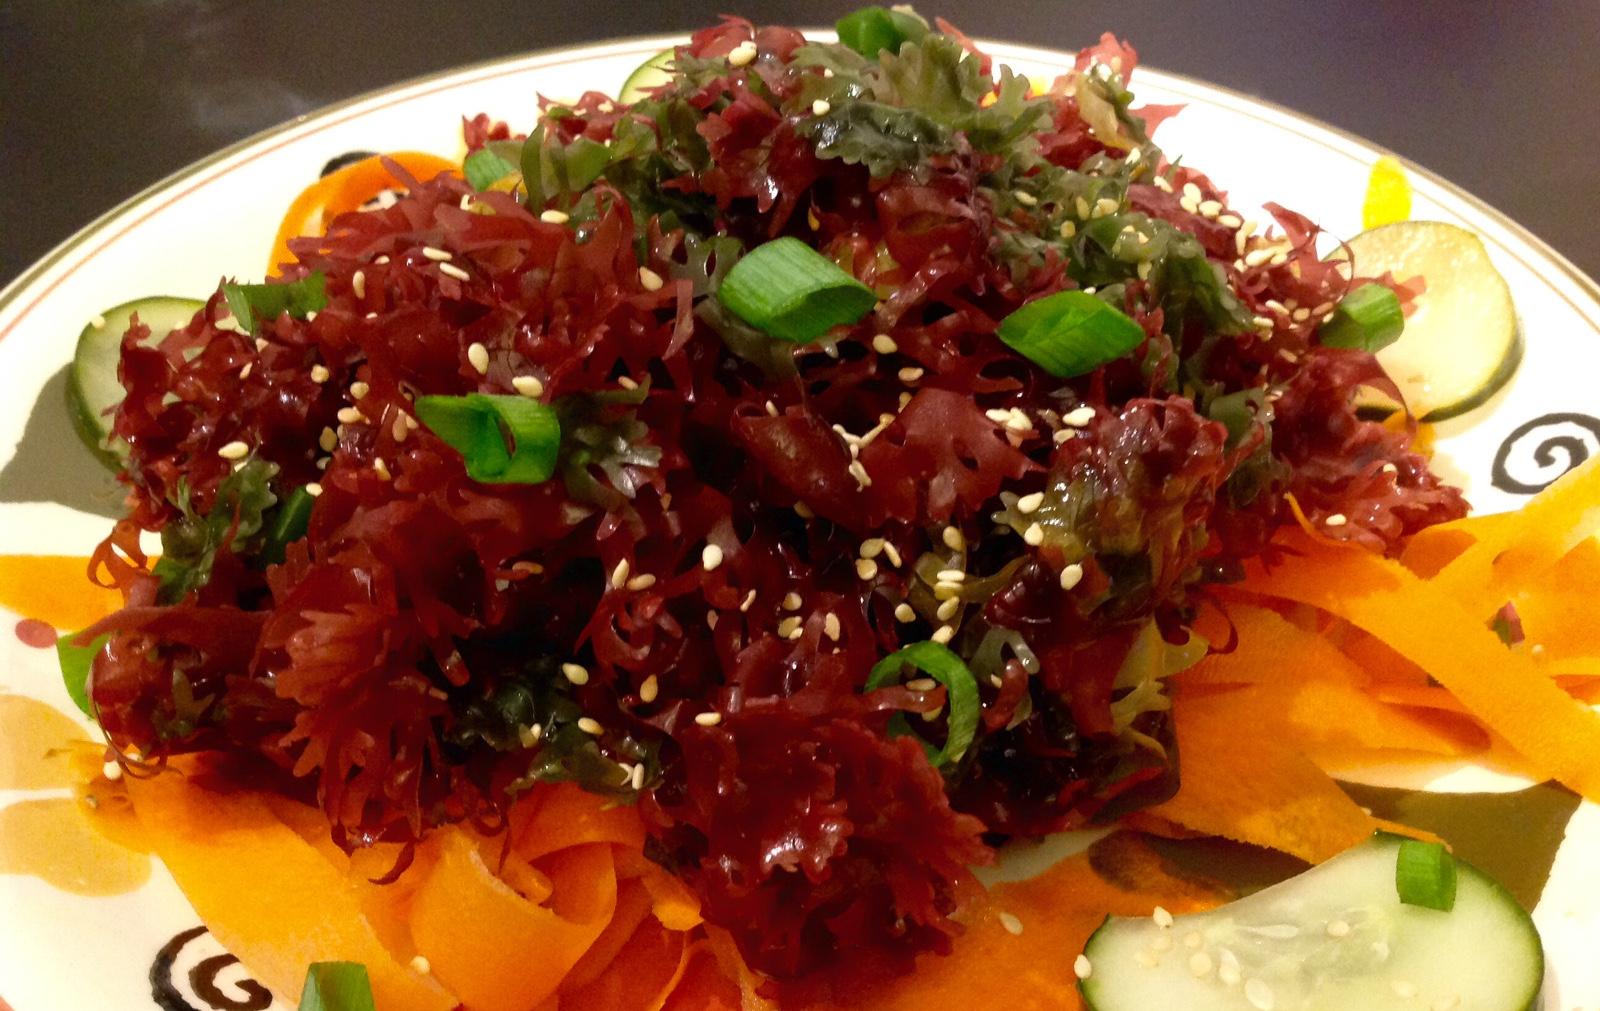 Seaweed Salad With Toasted Sesame Dressing [Vegan, Gluten-Free]